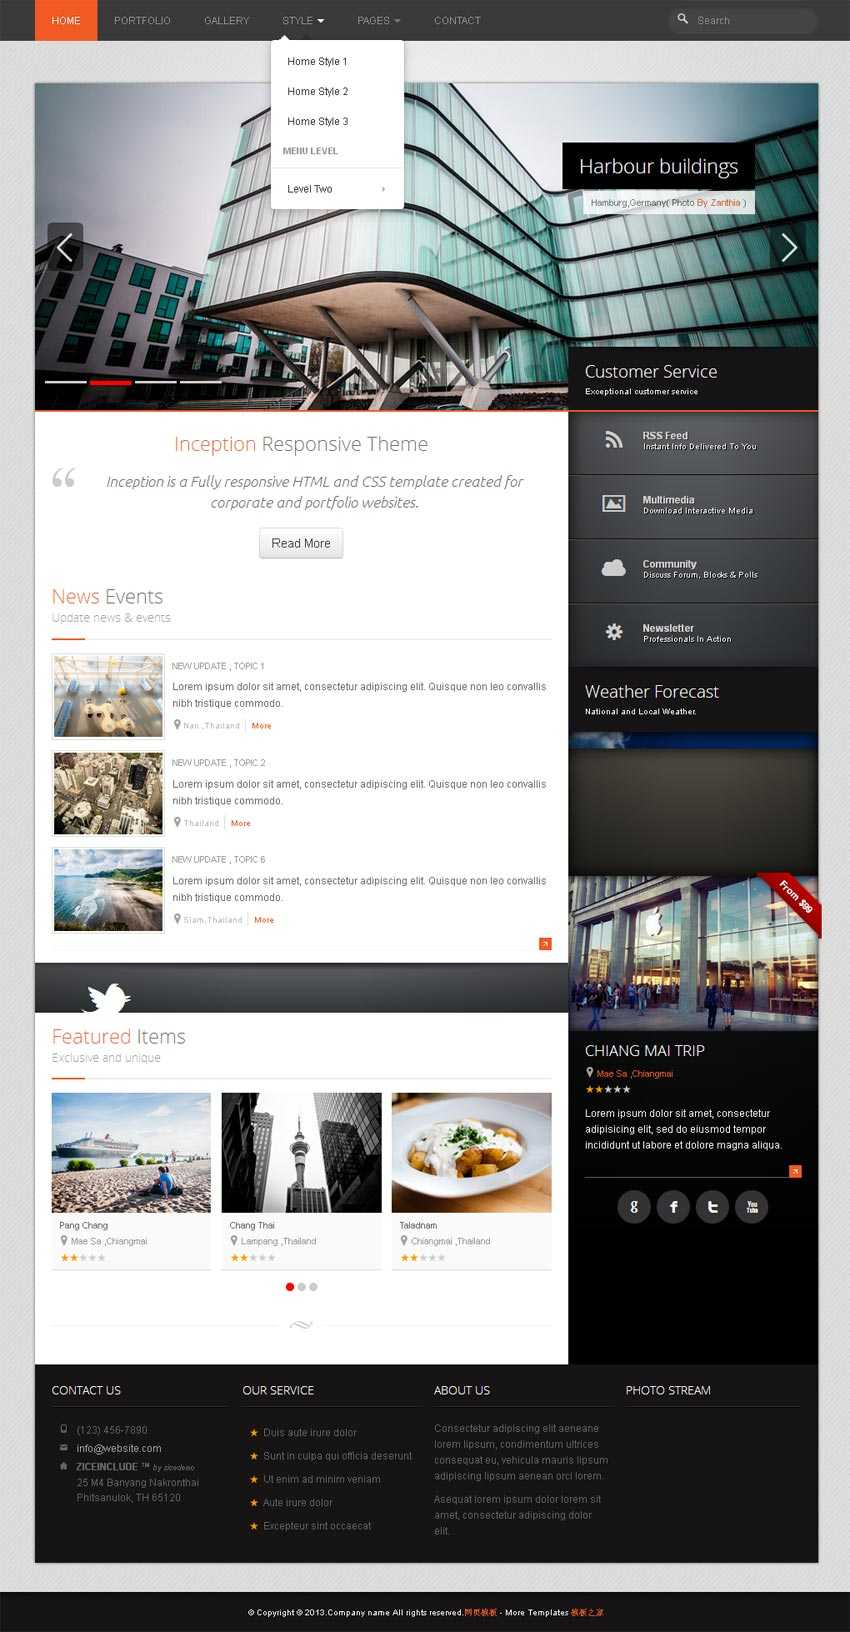 html5 bootstrap响应式旅游美食网站模板源码下载